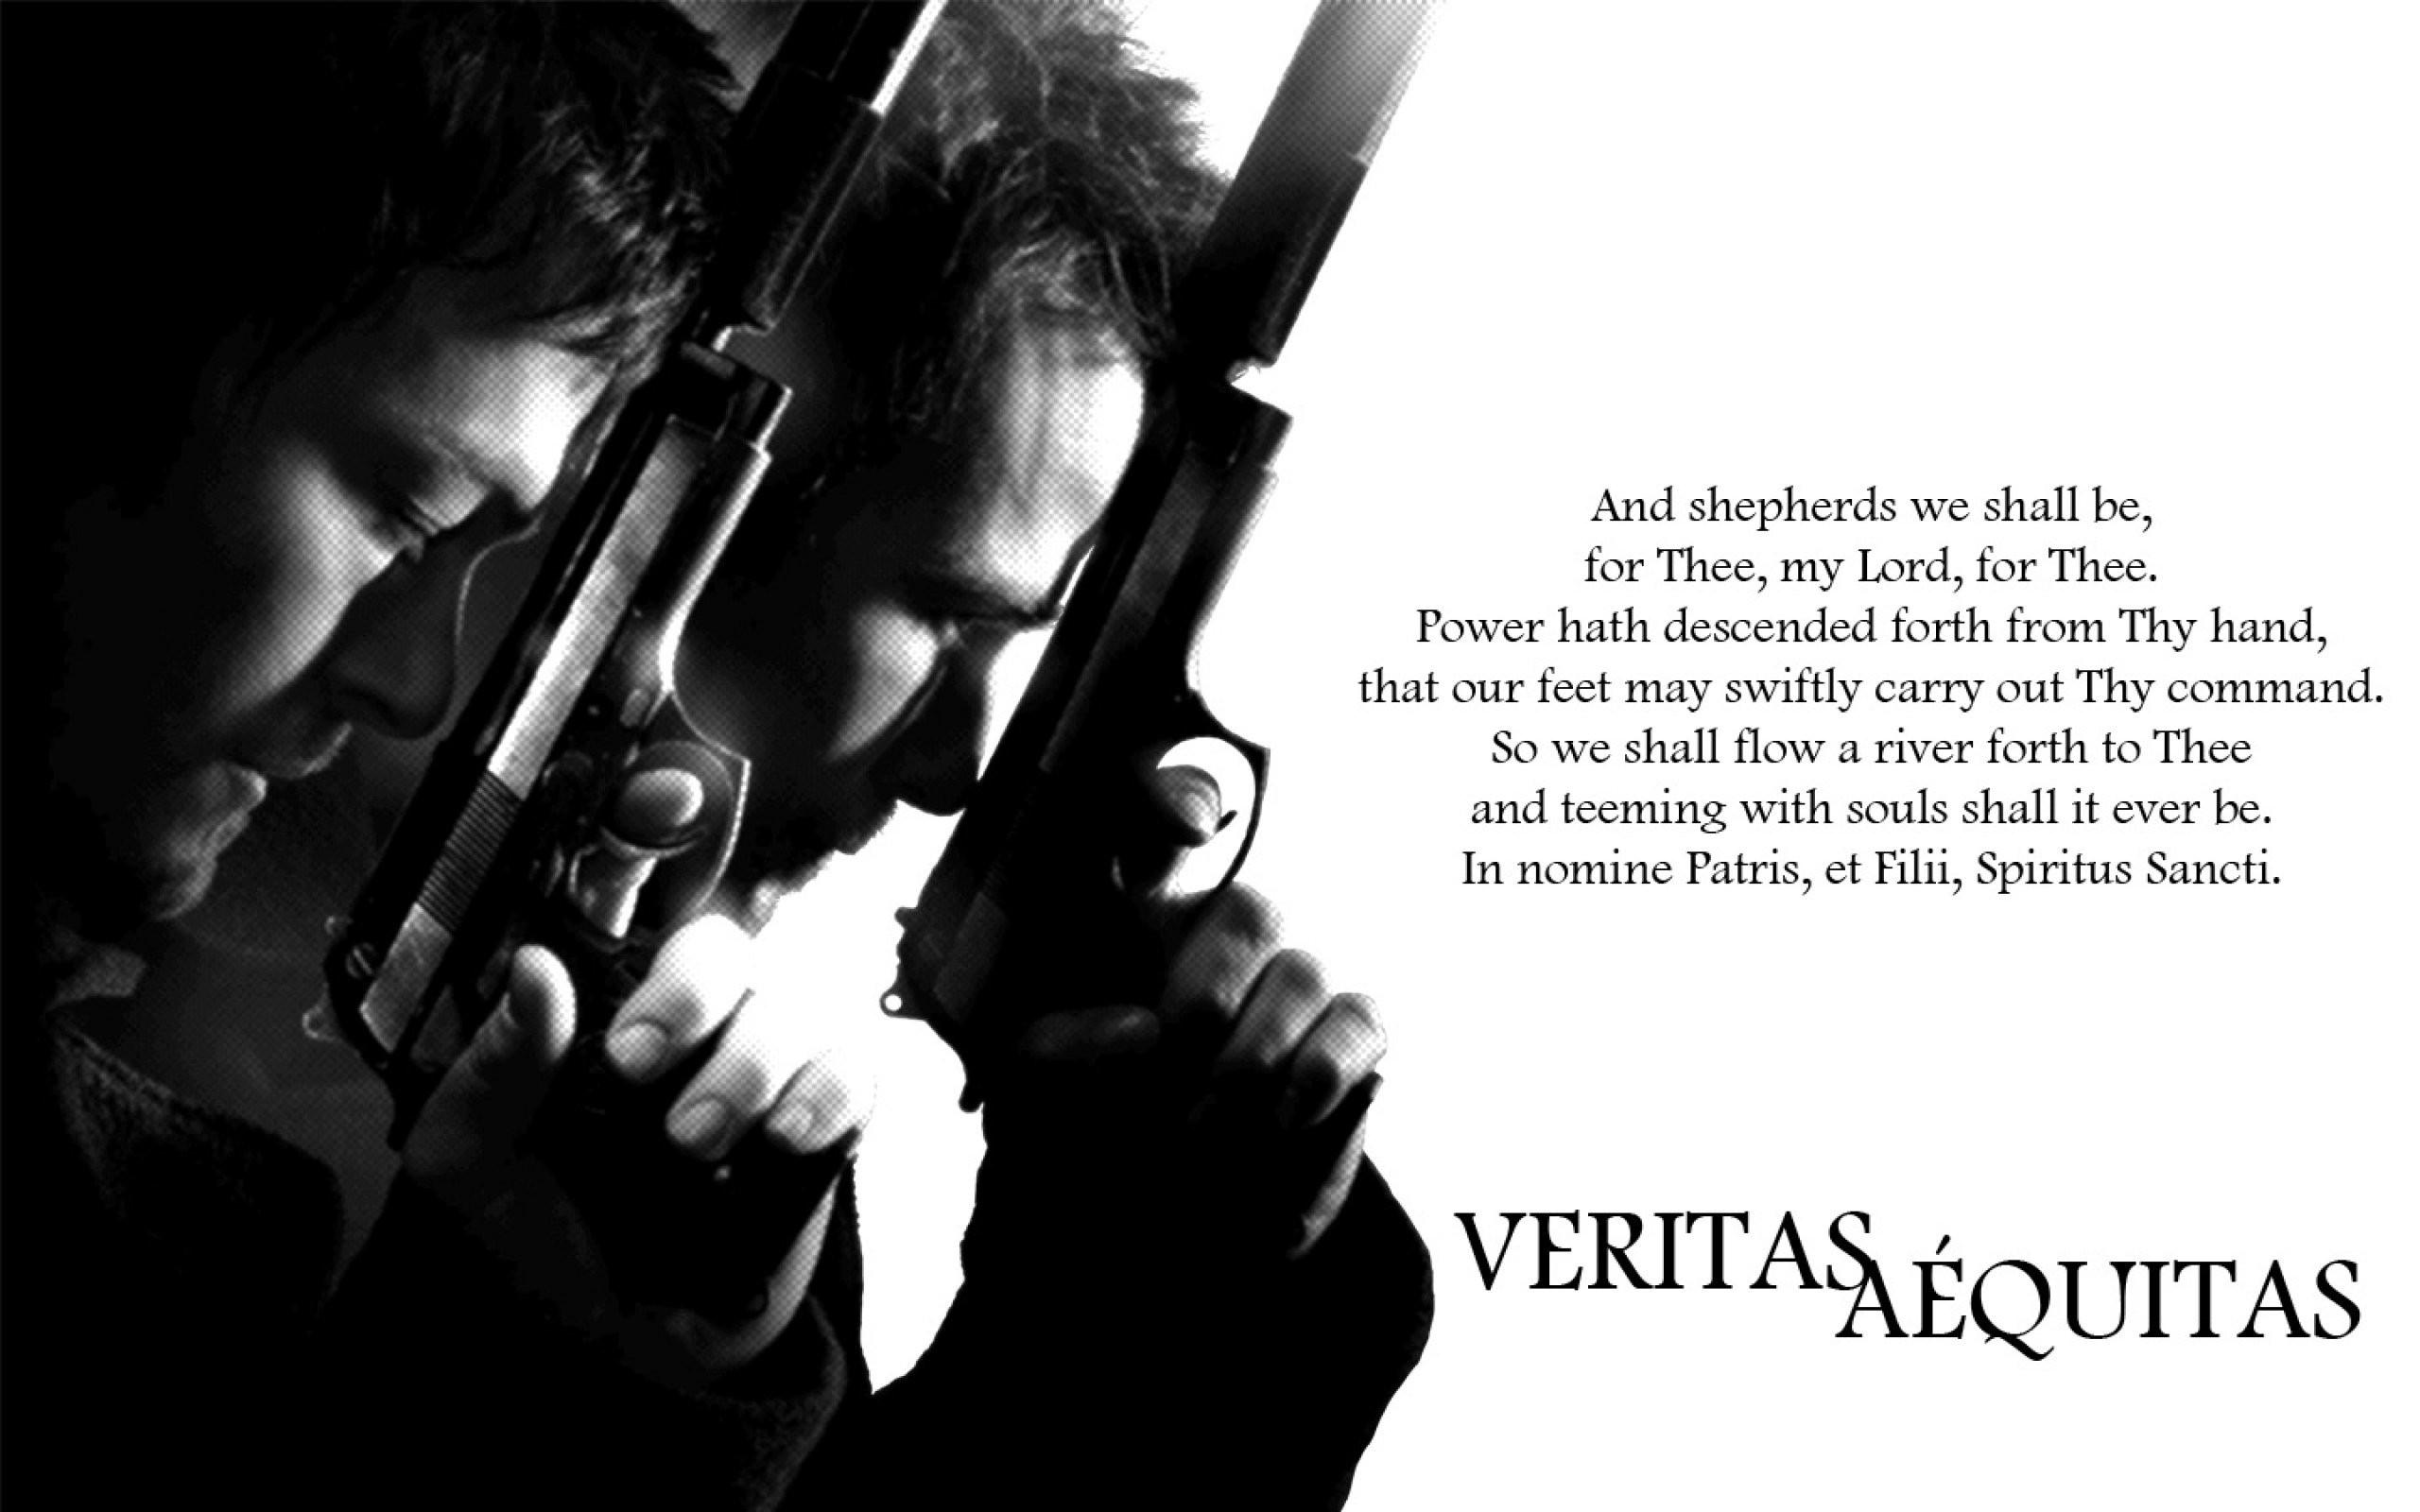 BOONDOCK SAINTS action crime thriller weapon gun pistol wallpaper |  | 499668 | WallpaperUP